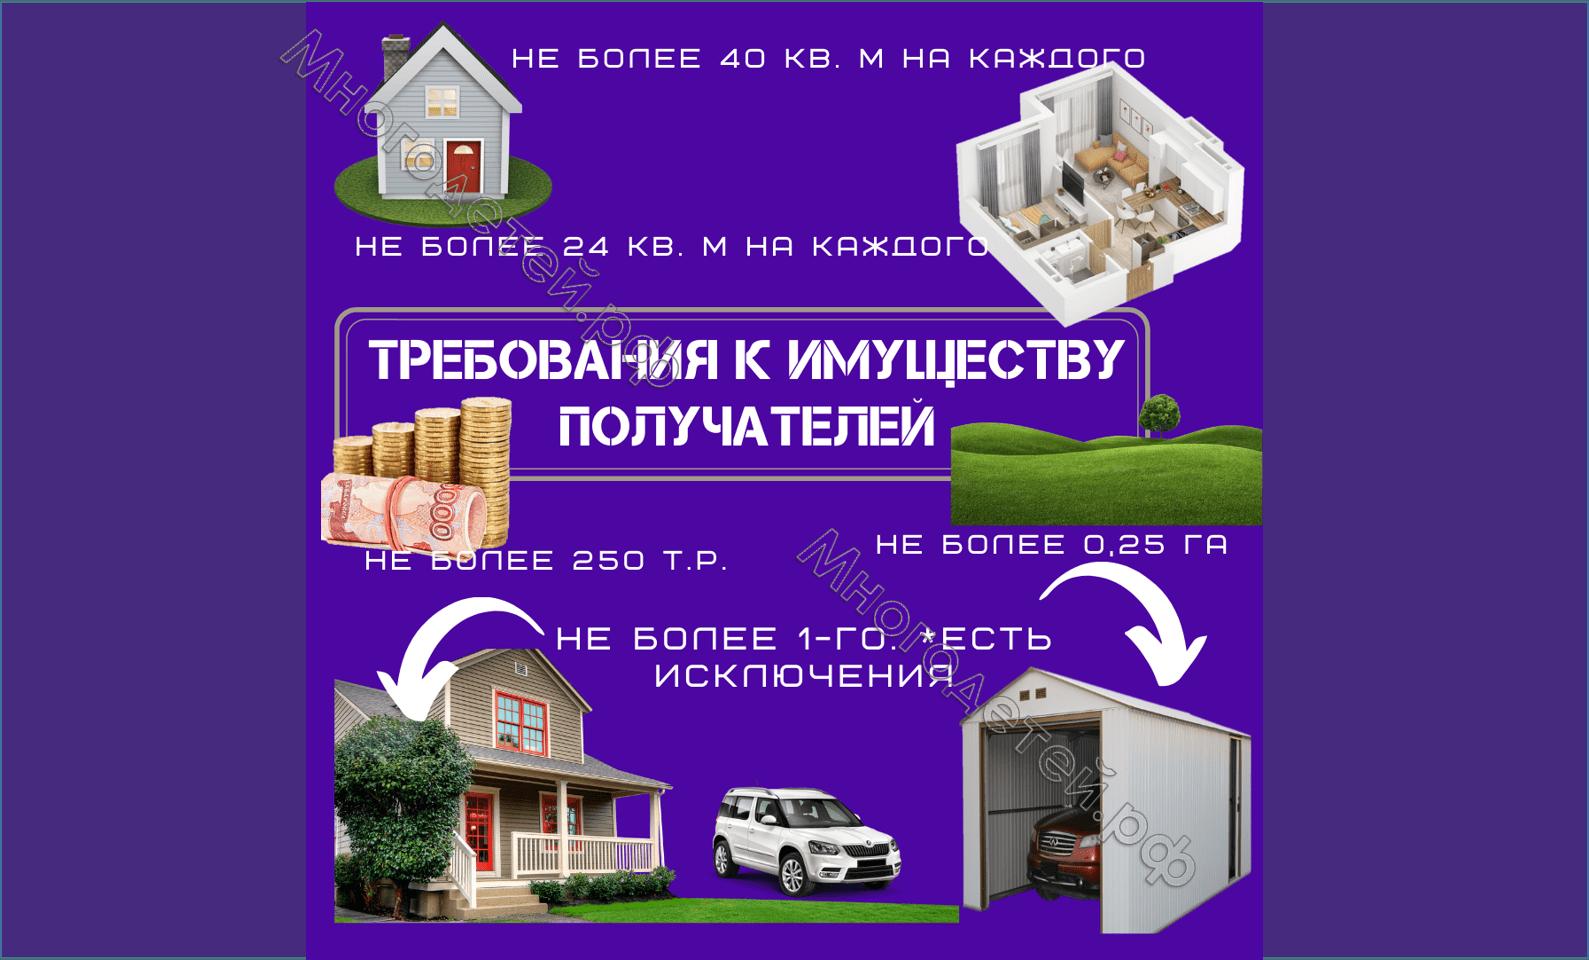 имущество при назначении пособия 3 до 7 лет